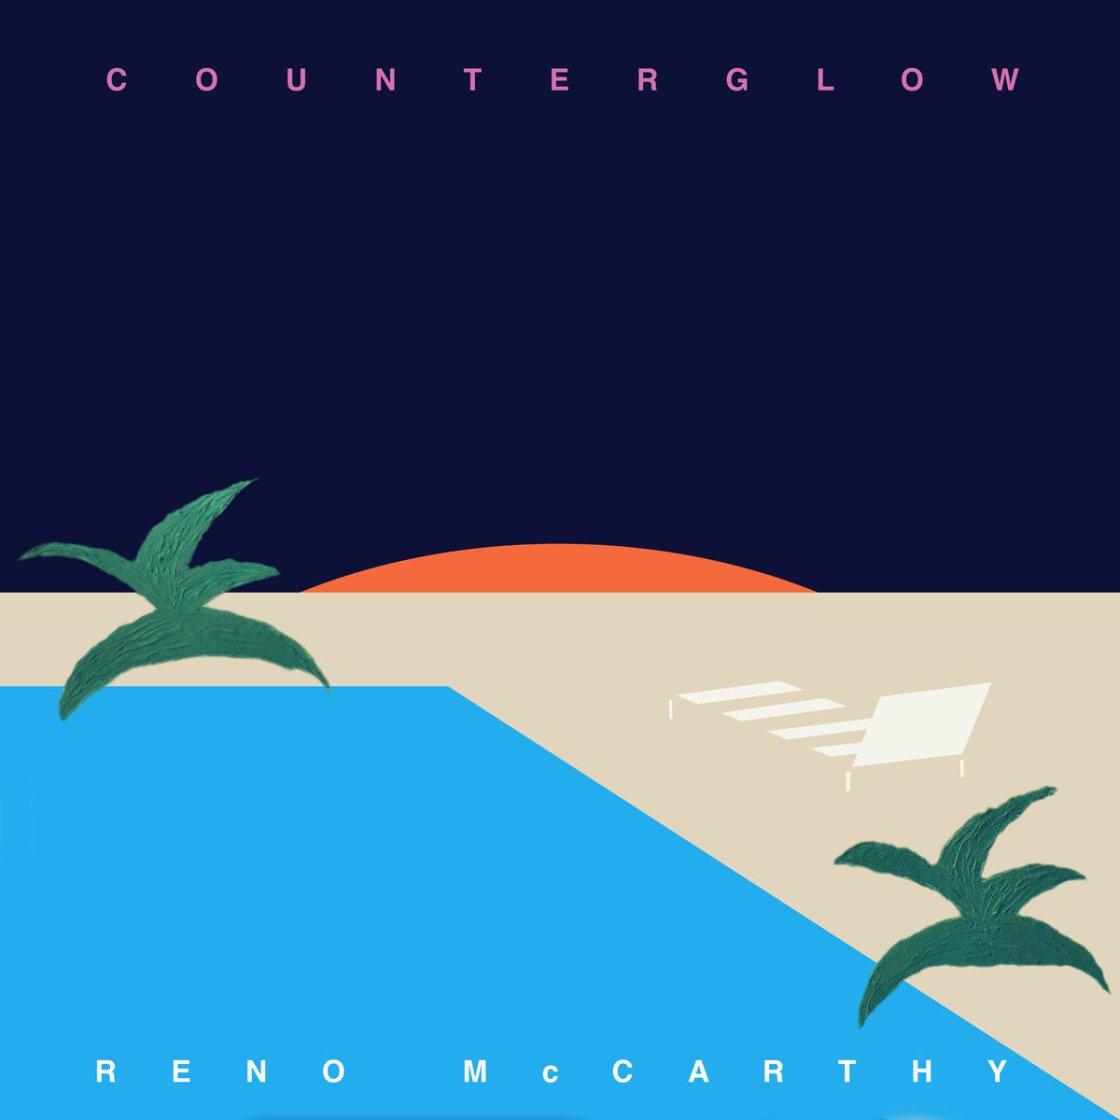 Reno McCarthy Counterglow